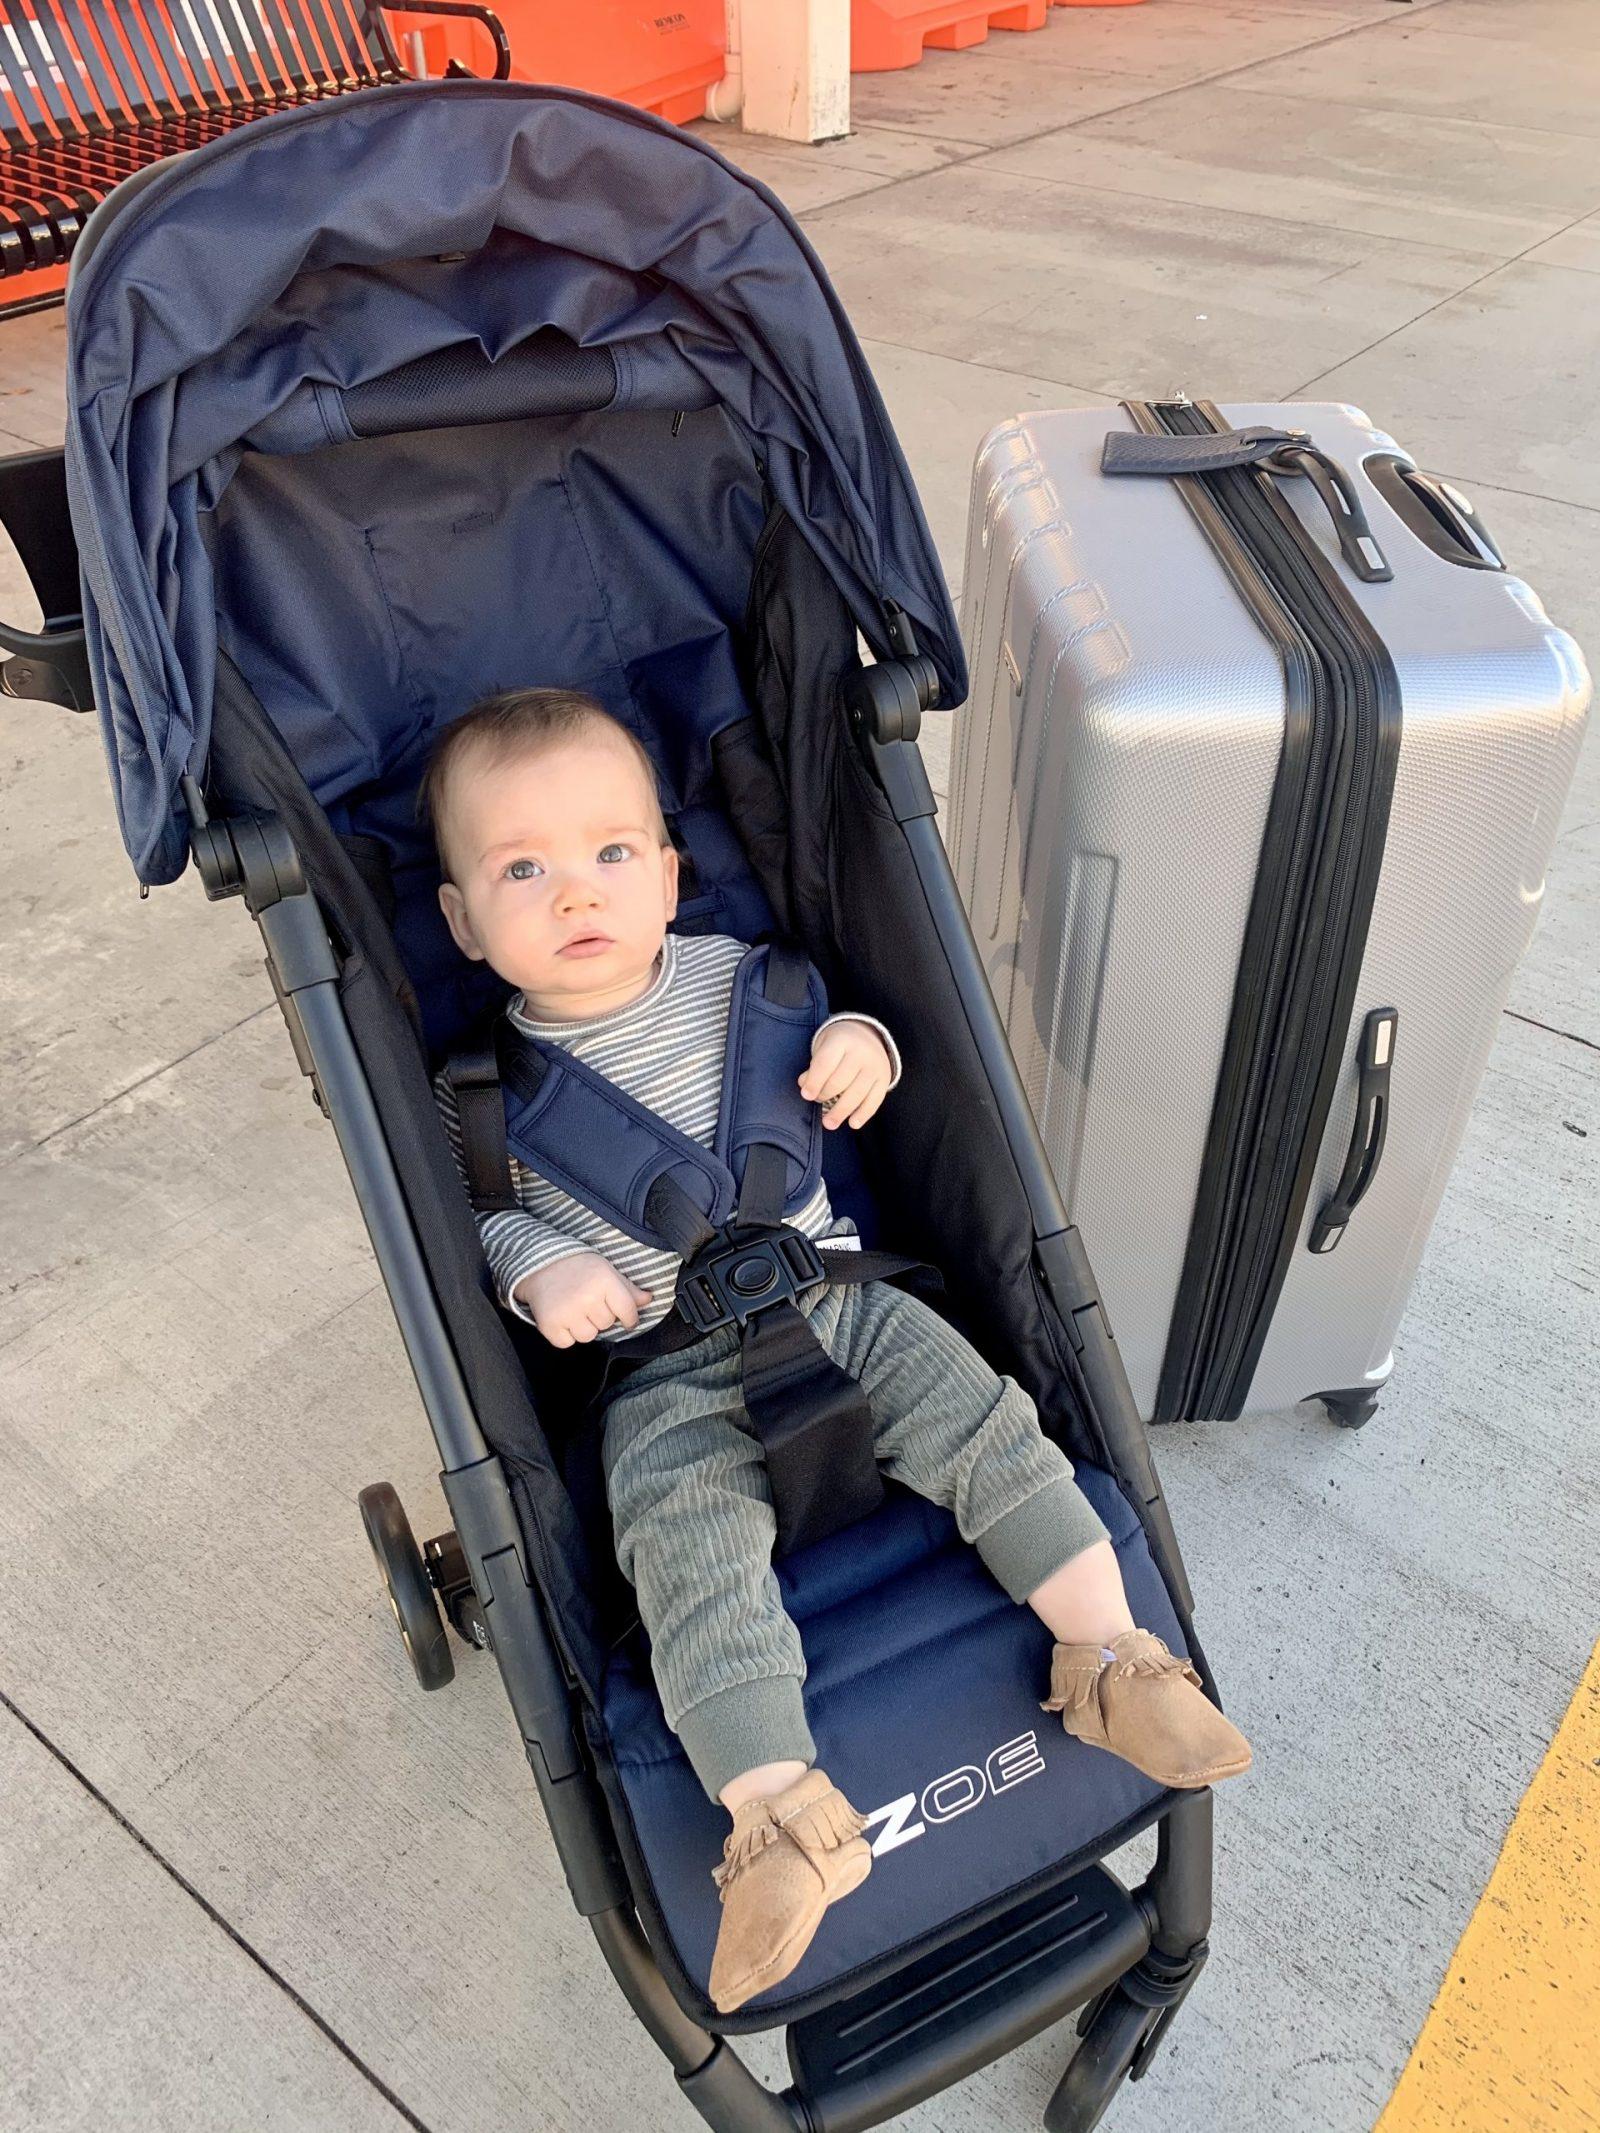 Zoe xlc traveler stroller